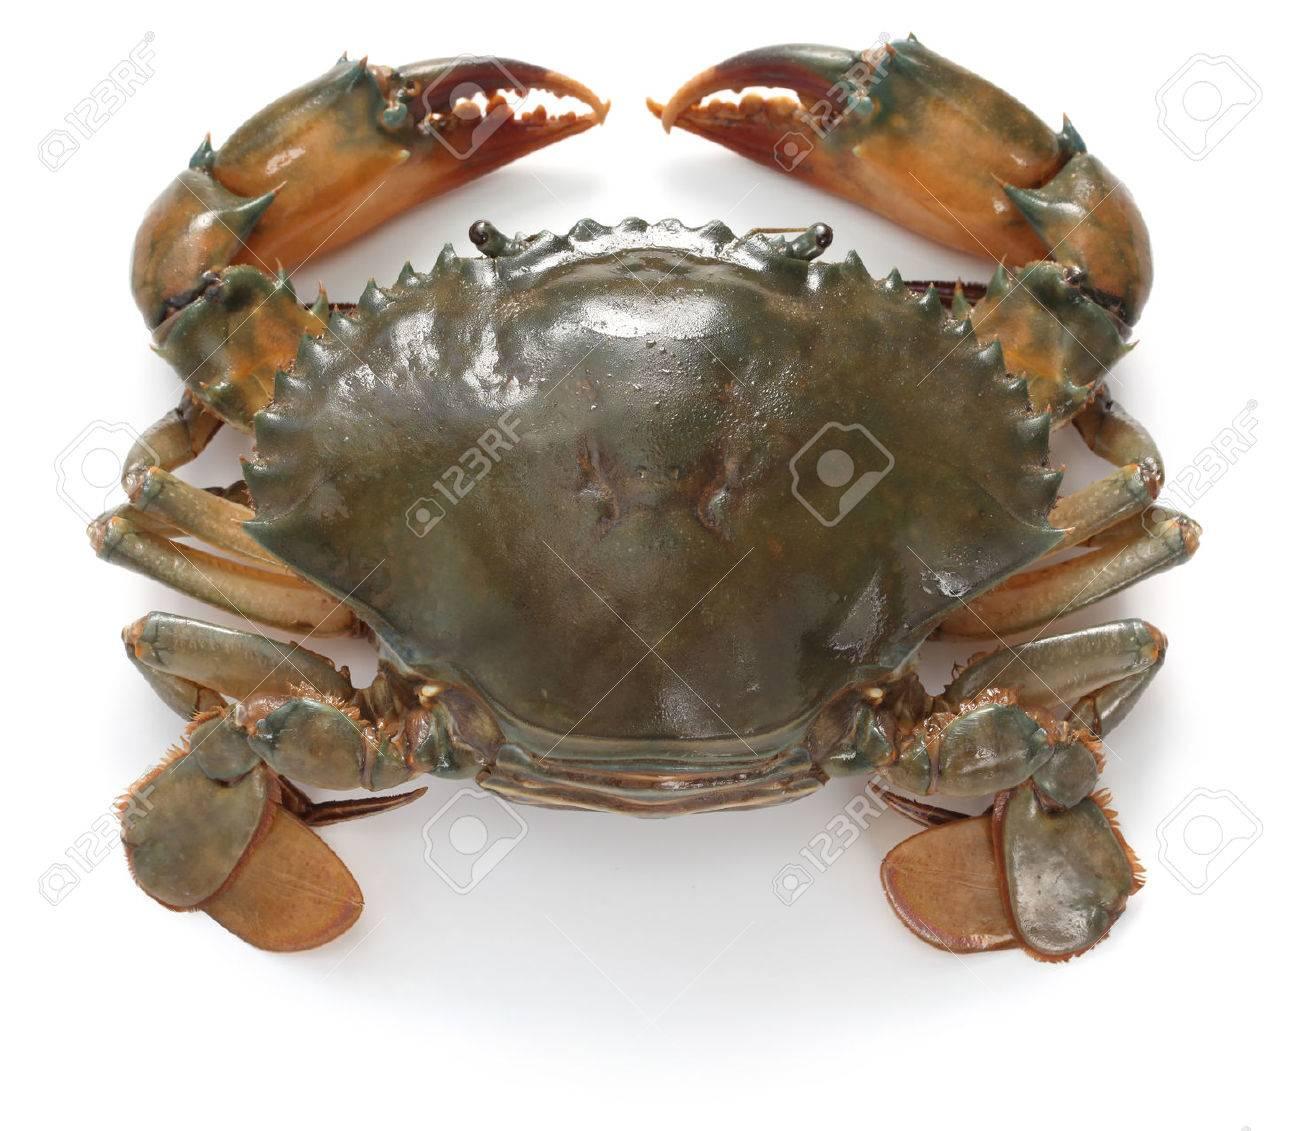 Live Mud Crab,Live King Crab,Live Blue Crab Red King Crab For Sale - Buy  Live Mud Crabs/blue Crabs/king Crabs /live Seafood For Sale Product on